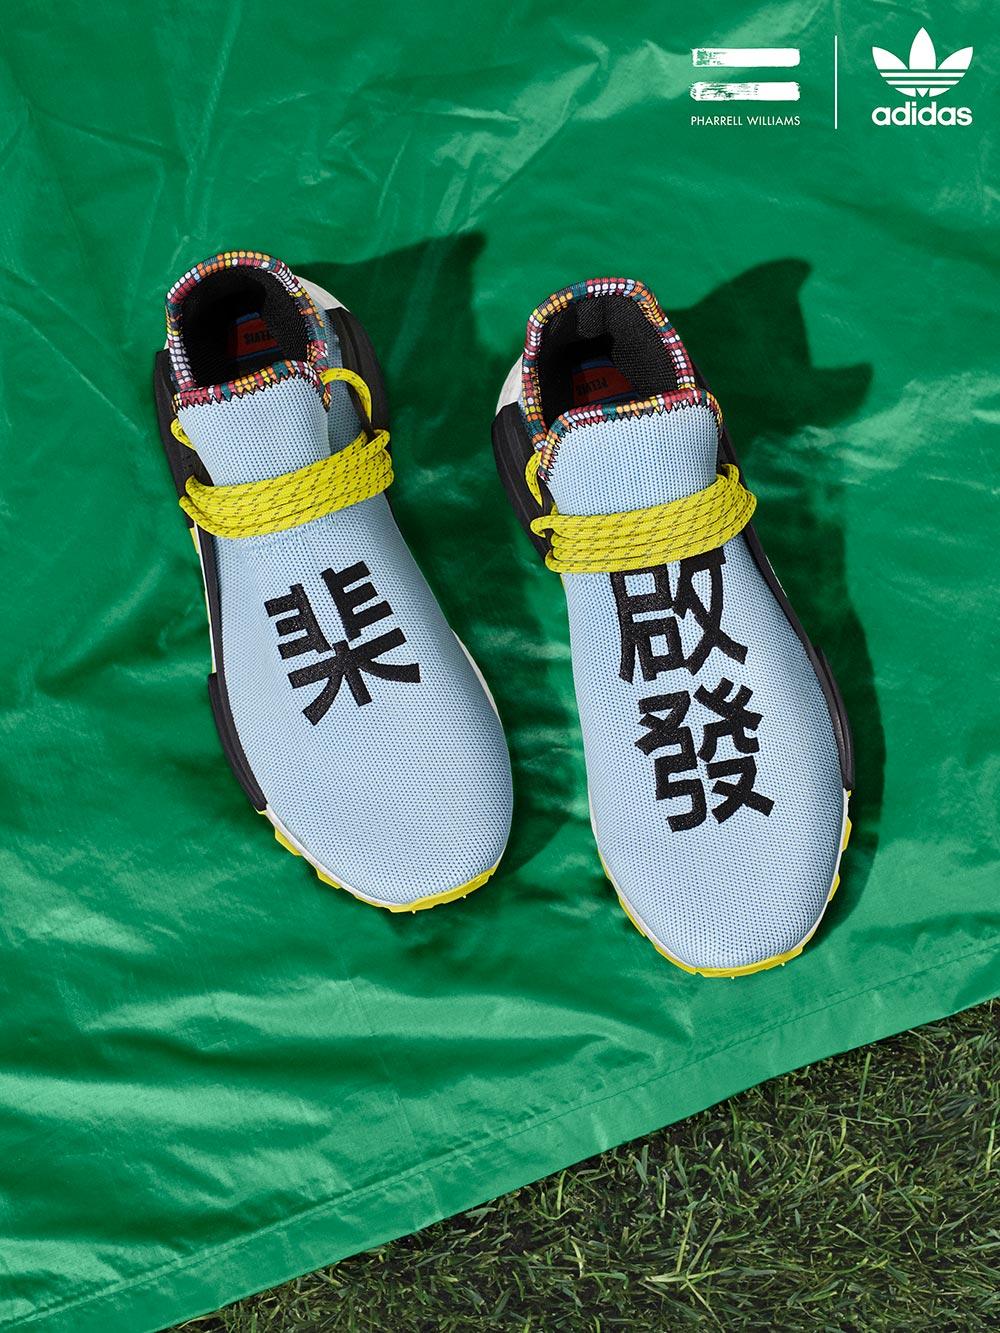 size 40 8653c 65a96 adidas Originals by Pharrell Williams SOLARHU NMD | Now ...